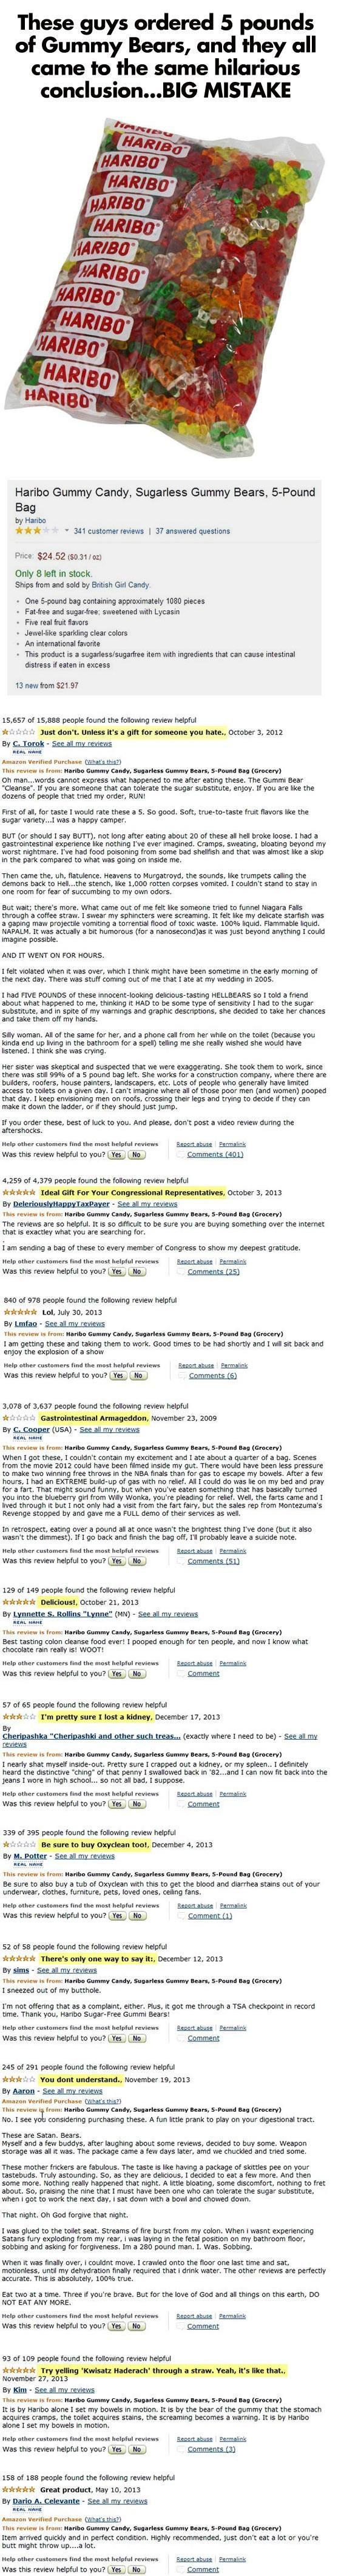 Hilarious Reviews of Haribo Sugar Free Gummy Bears